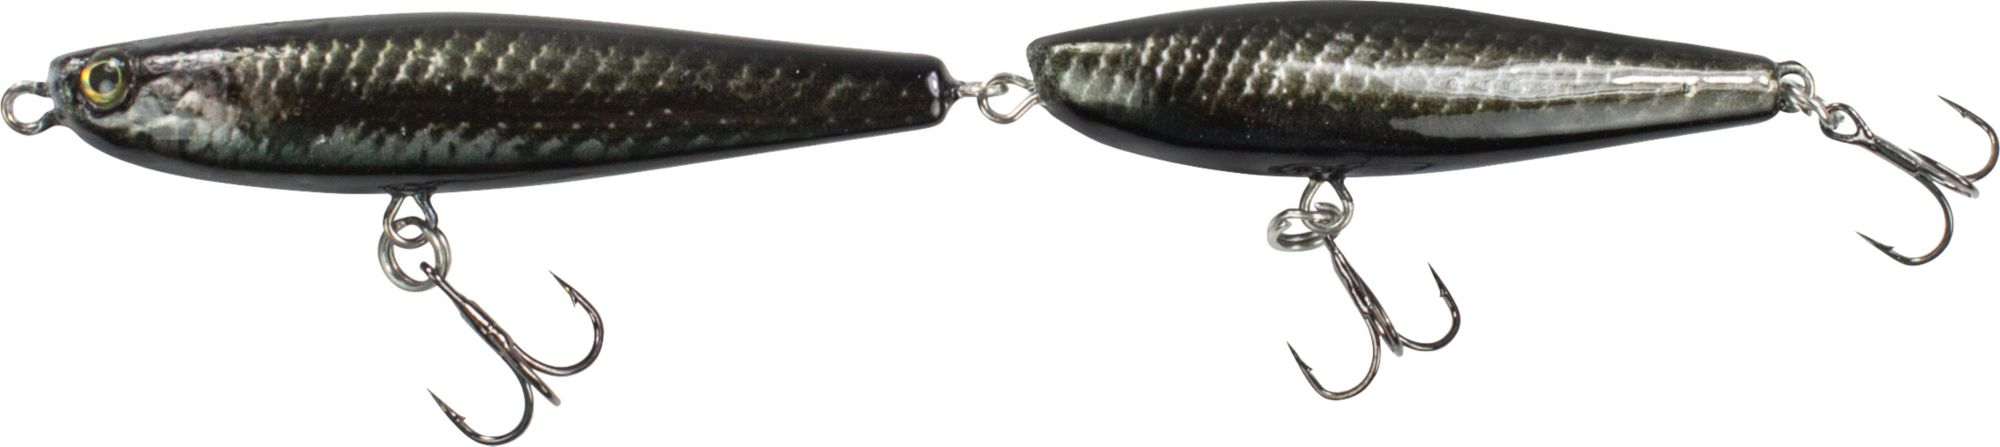 Lunkerhunt Link Topwater Lure, Black Mamba